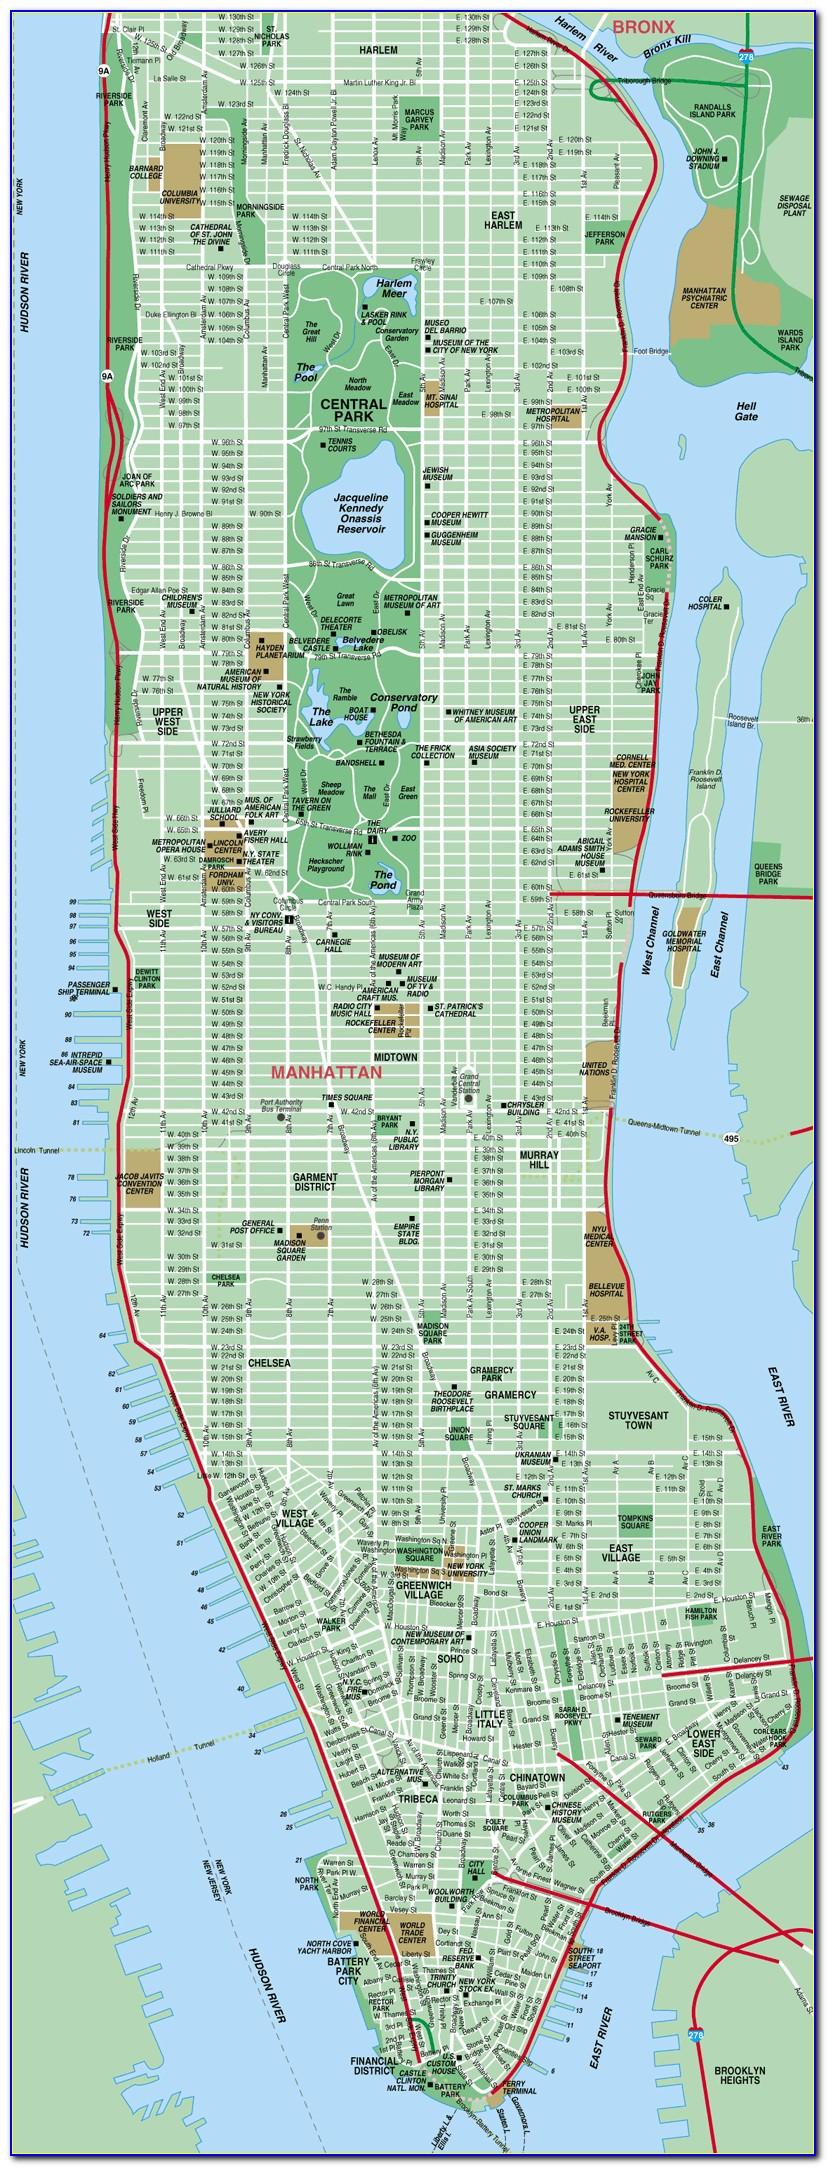 Street Map Of New York City Manhattan